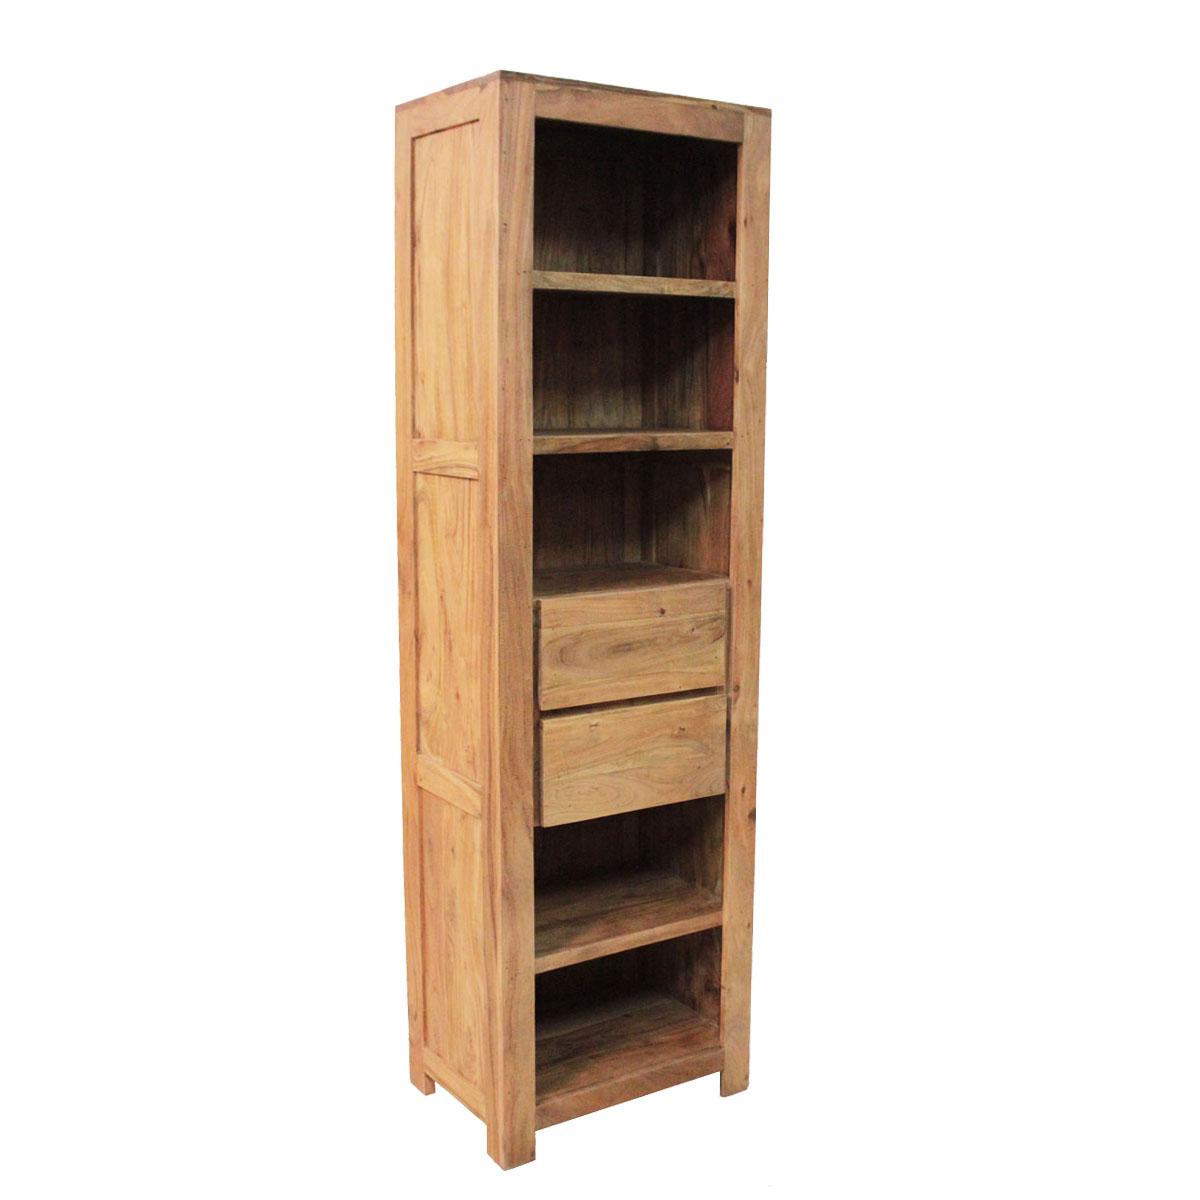 Regal Kolonialny Drewniany Wood Story Indigodecor